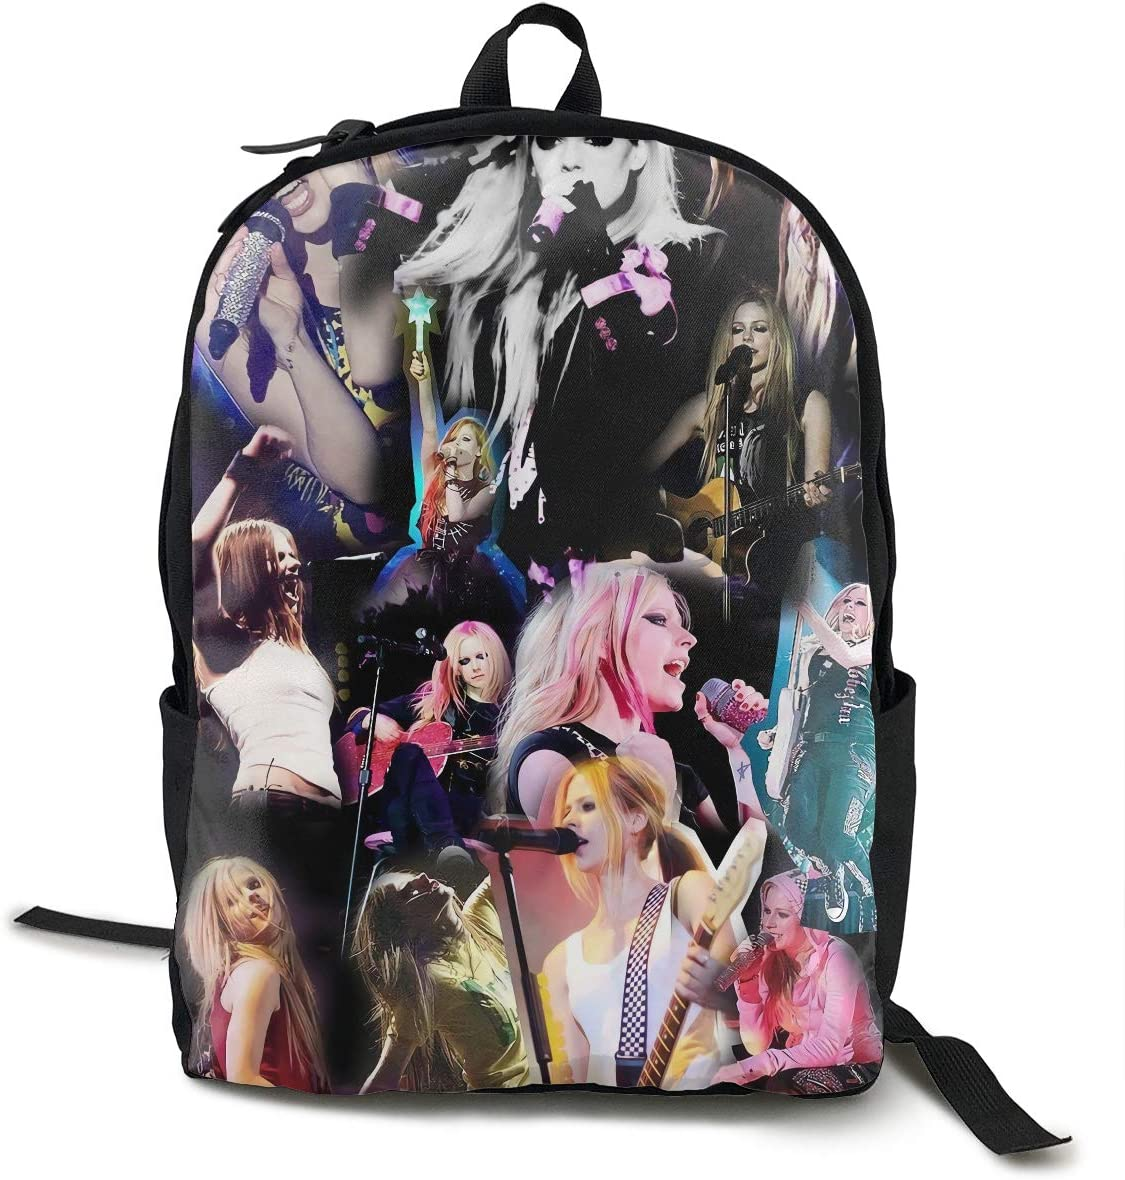 RodneyLRobbins Avril Lavigne College Backpack Big Student Bookbag Multipurpose Daypacks Modern Stylish Backpack